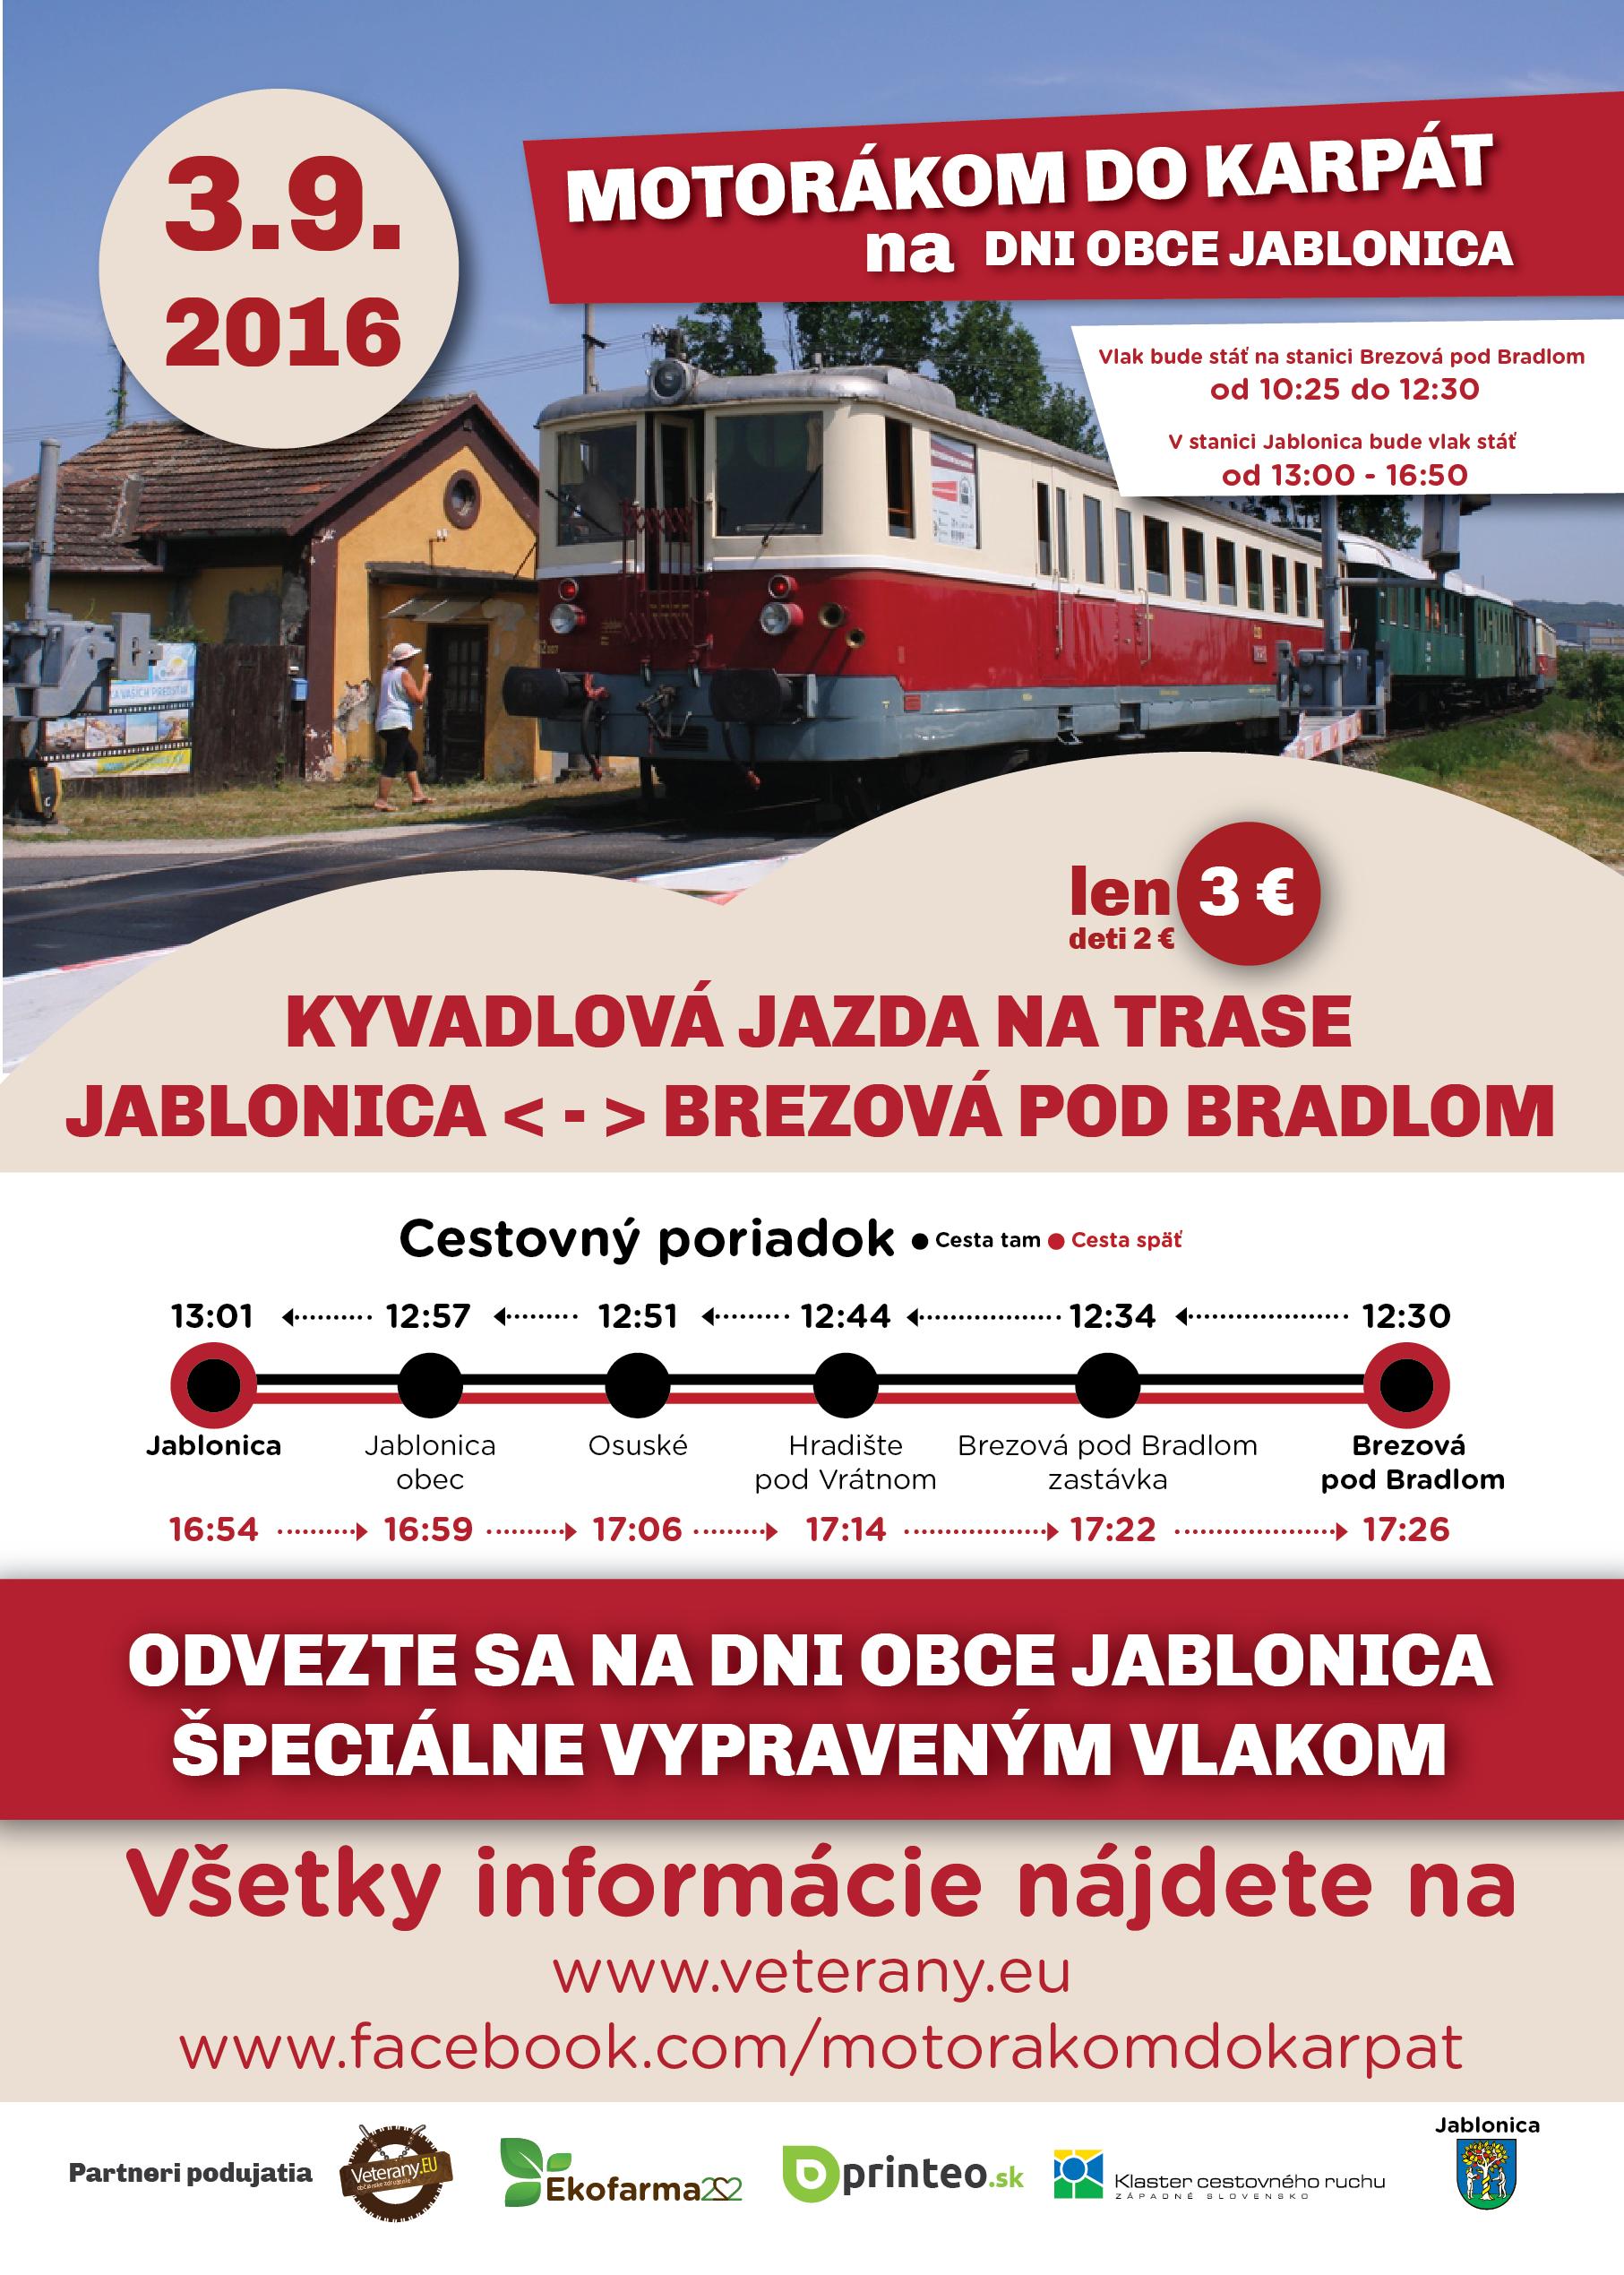 Motorakom do Karpat 3.9.2016 Kyvadlova jazda